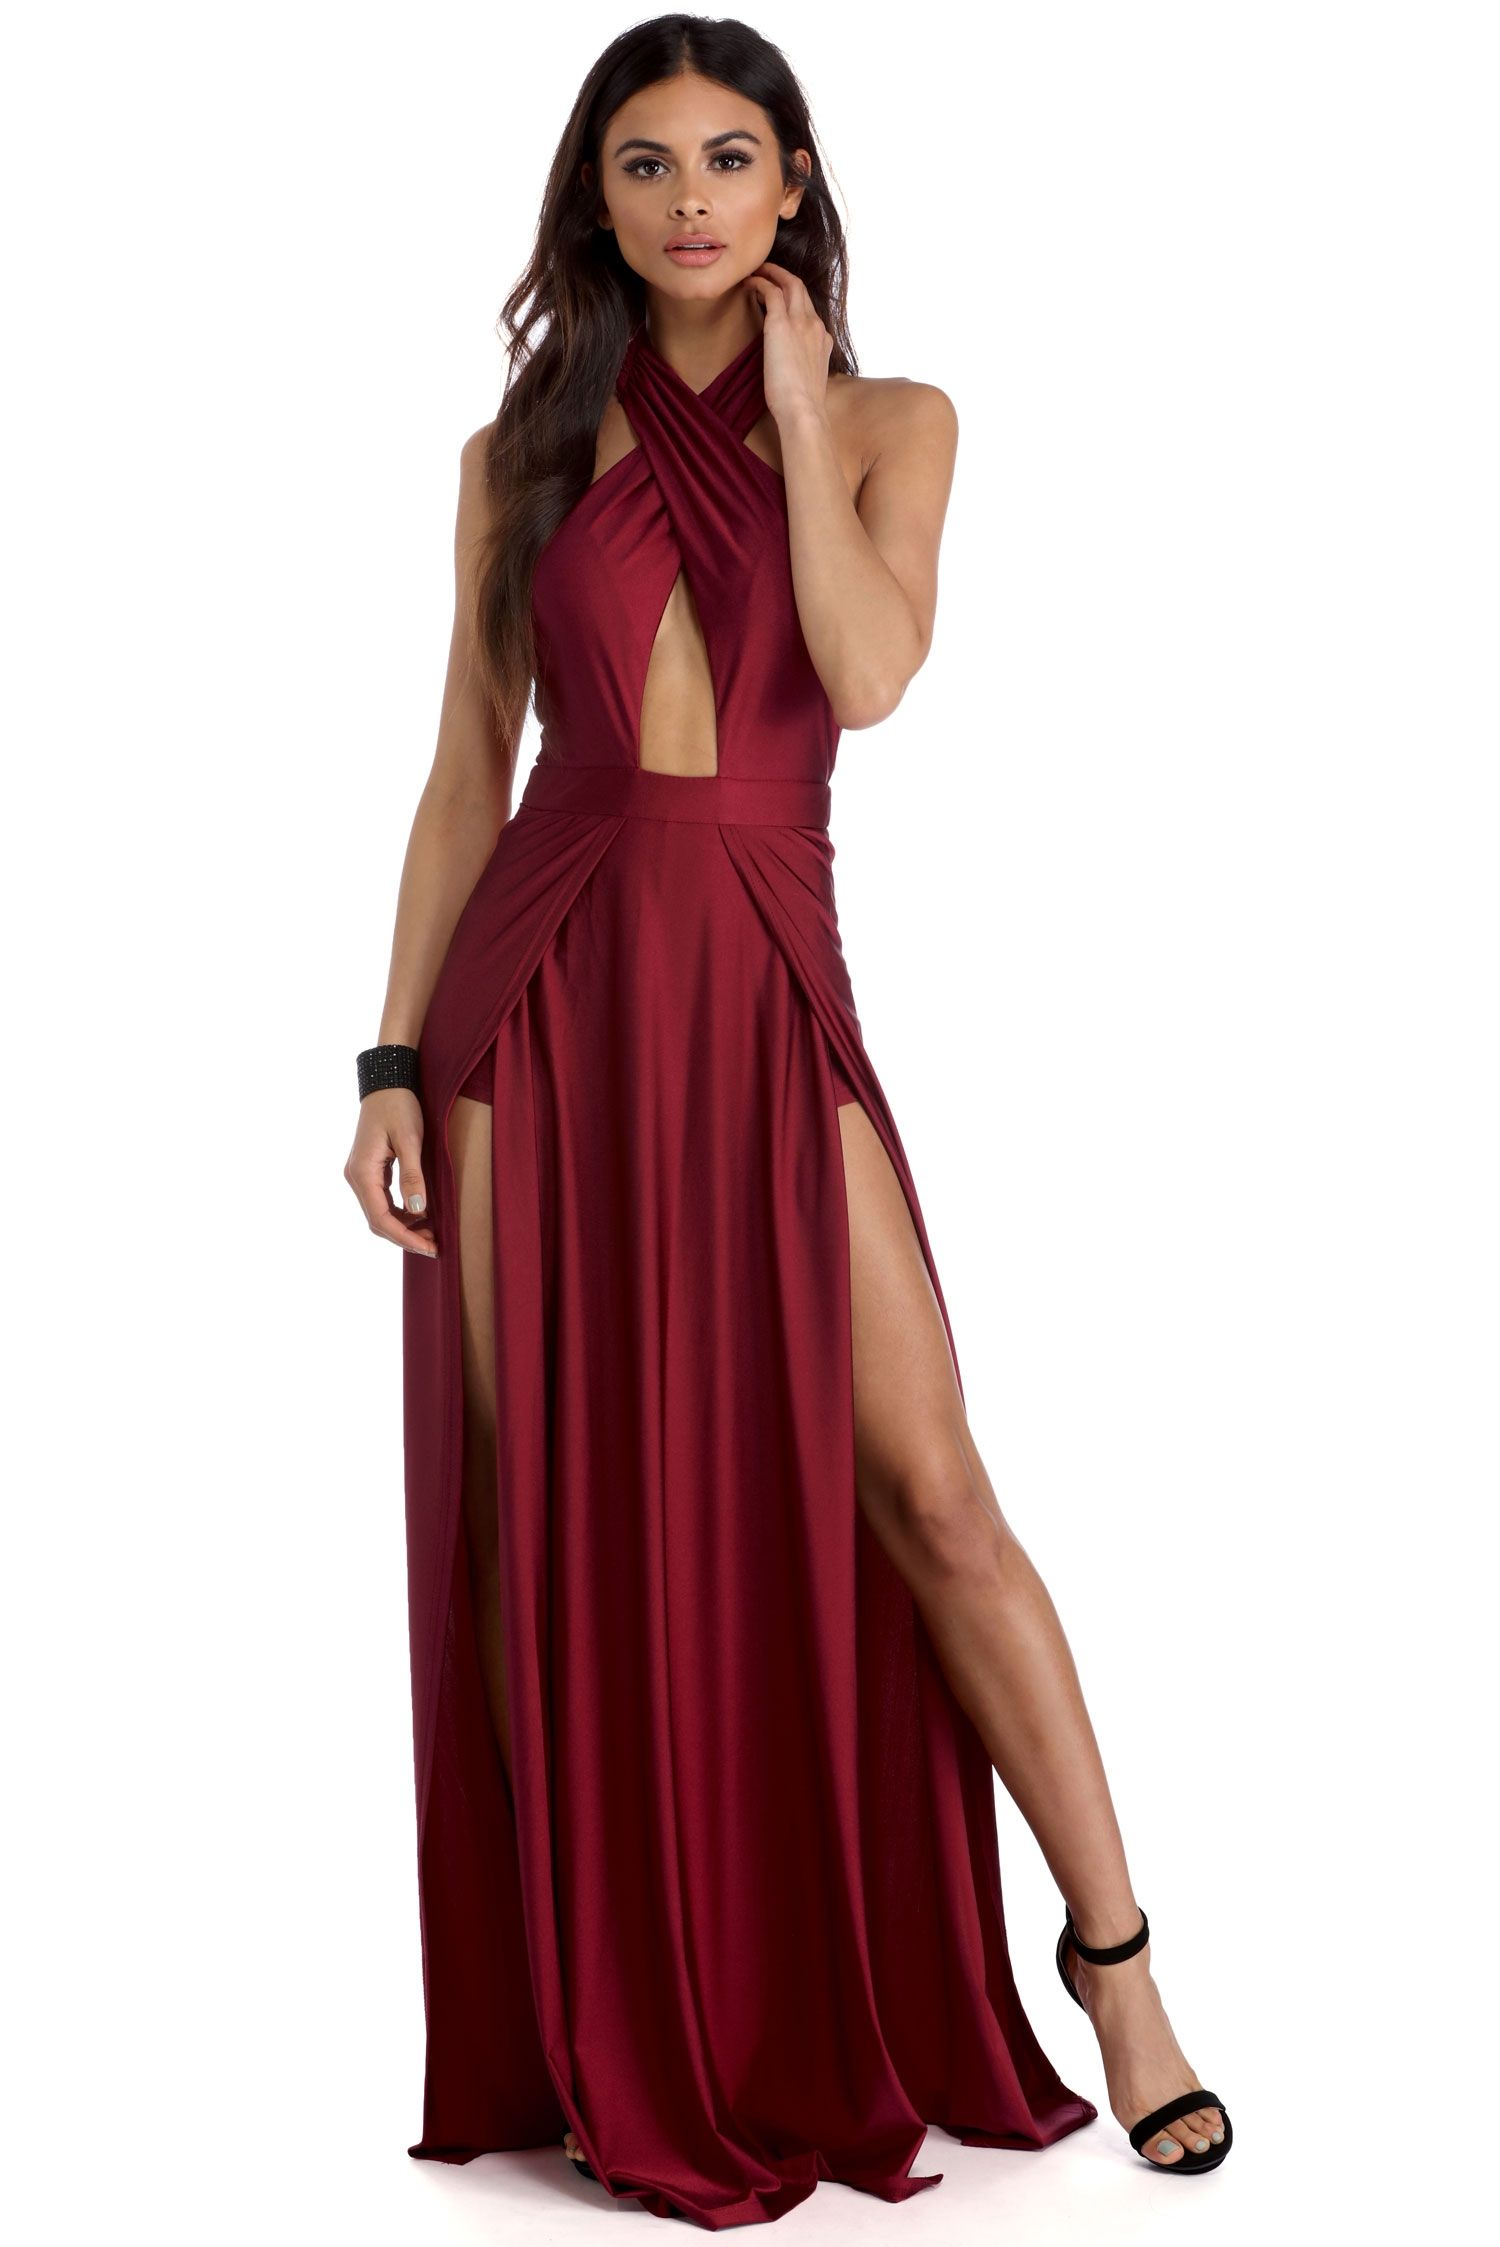 7fed9e2806 Genevieve Burgundy Double Slit Dress | Prahm in 2019 | Double slit ...